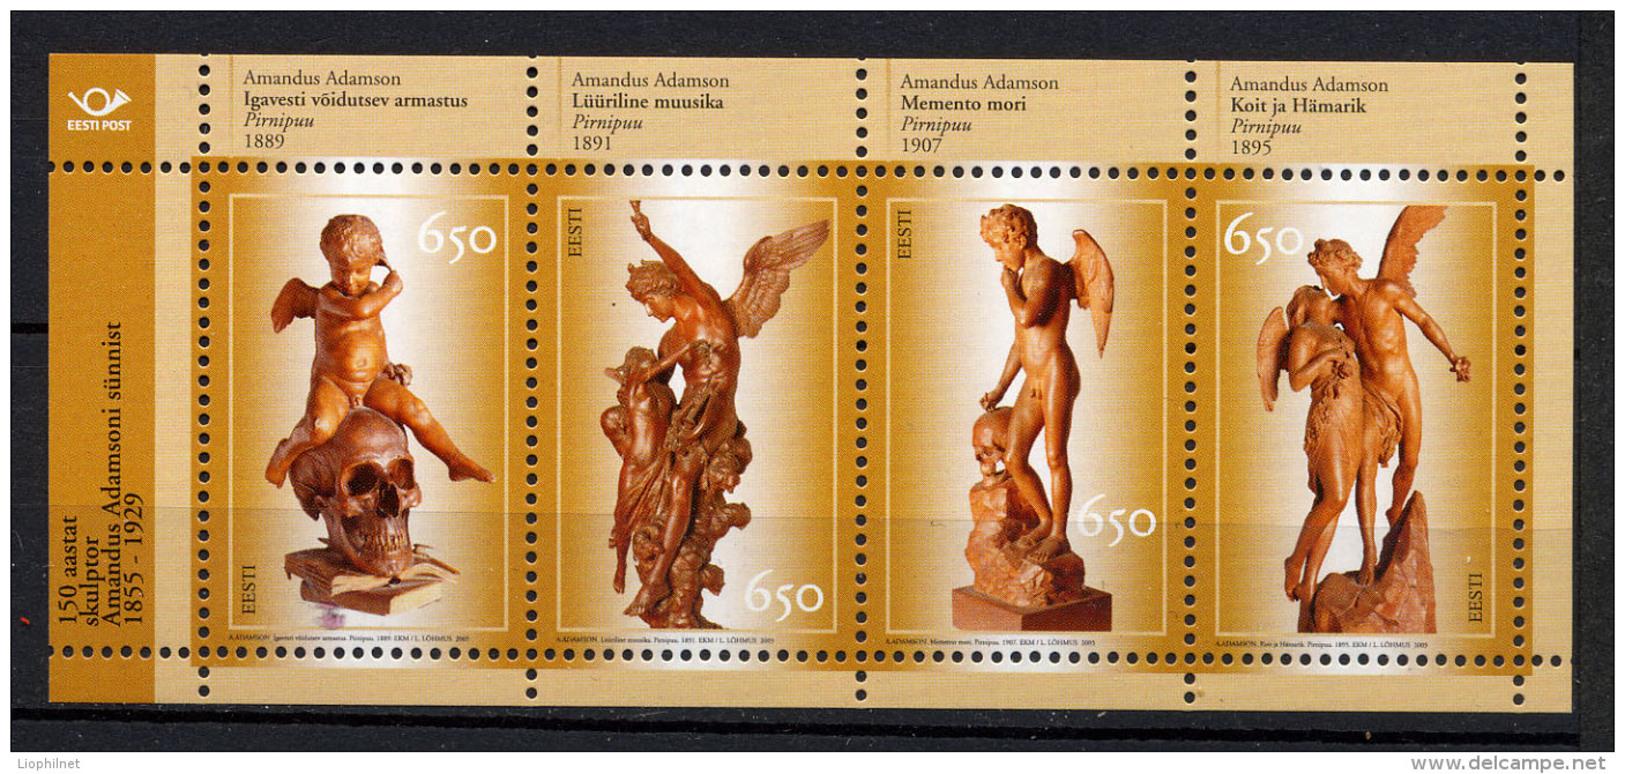 ESTONIE EESTI ESTONIA 2005, Sculptures Anges, Feuillet De 4 Valeurs, Neuf / Mint. R383 - Estonie